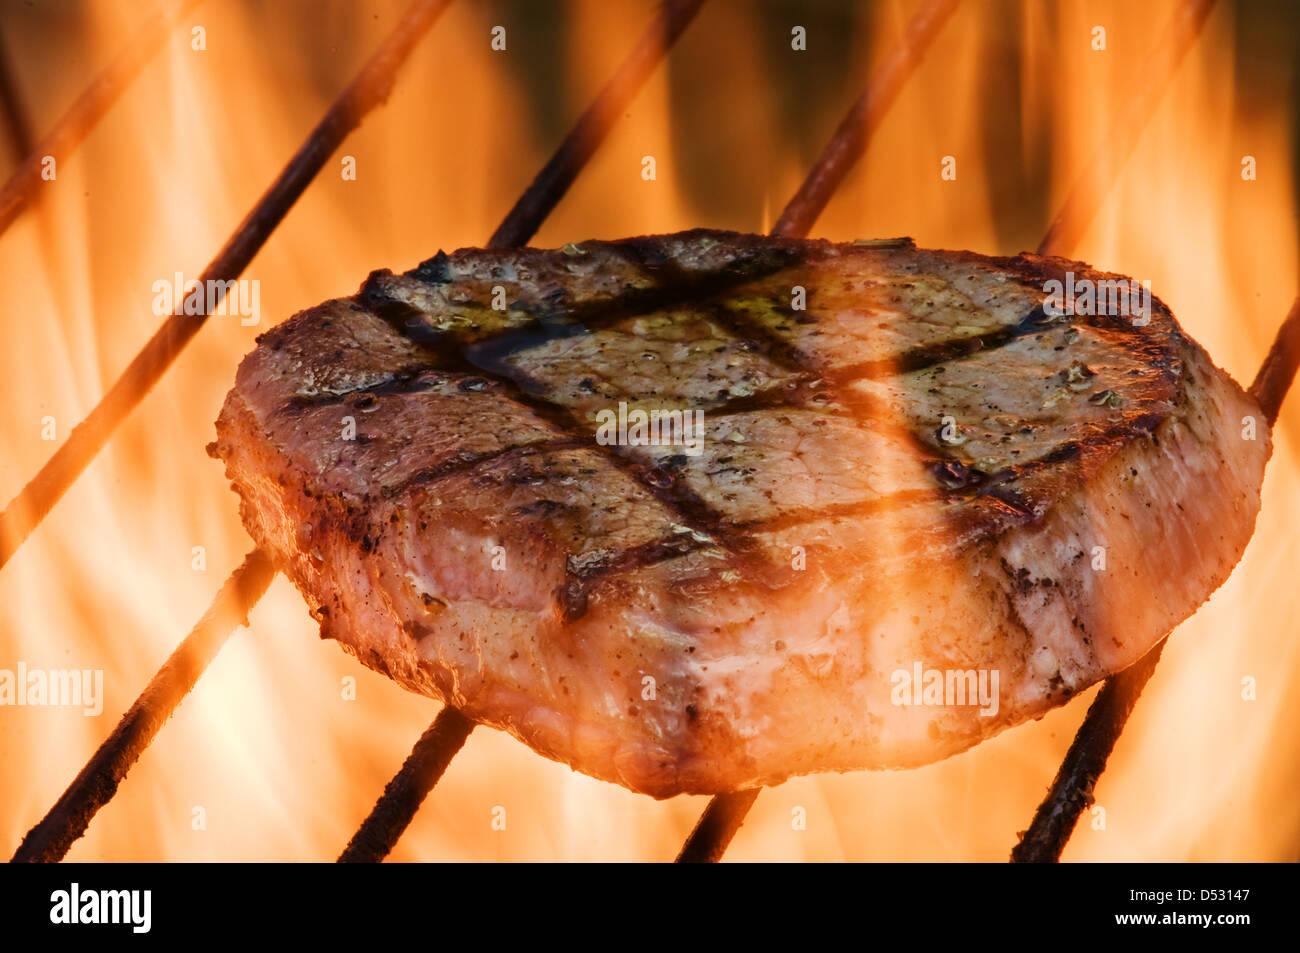 striped steak on fiery grill closeup - Stock Image